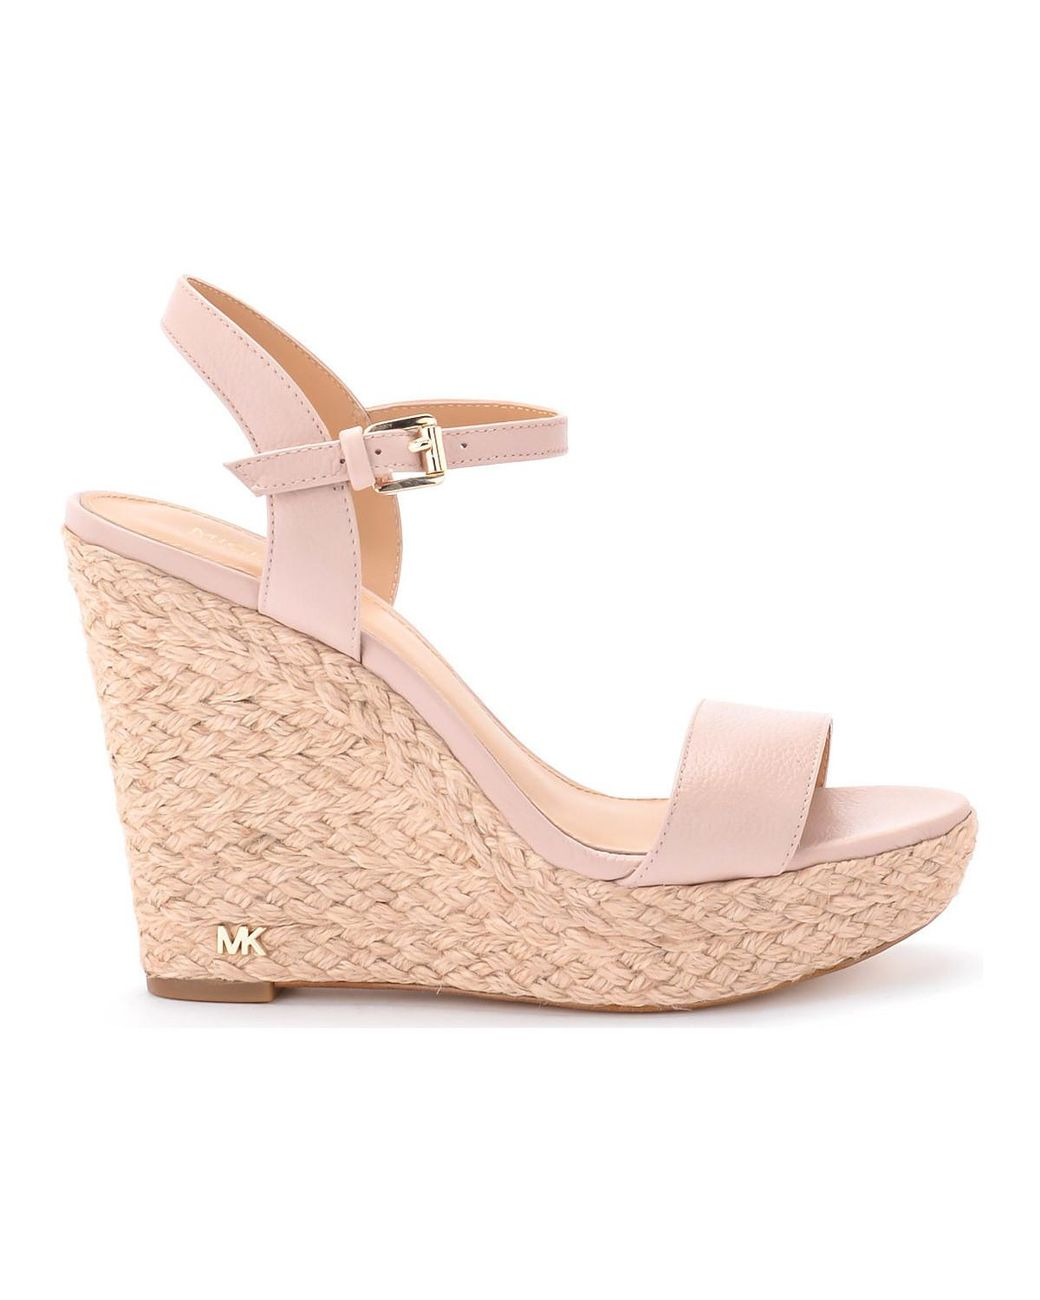 d2ba3286ab59 MICHAEL Michael Kors Jill Pale Pink Wedge Sandal Women s Sandals In ...